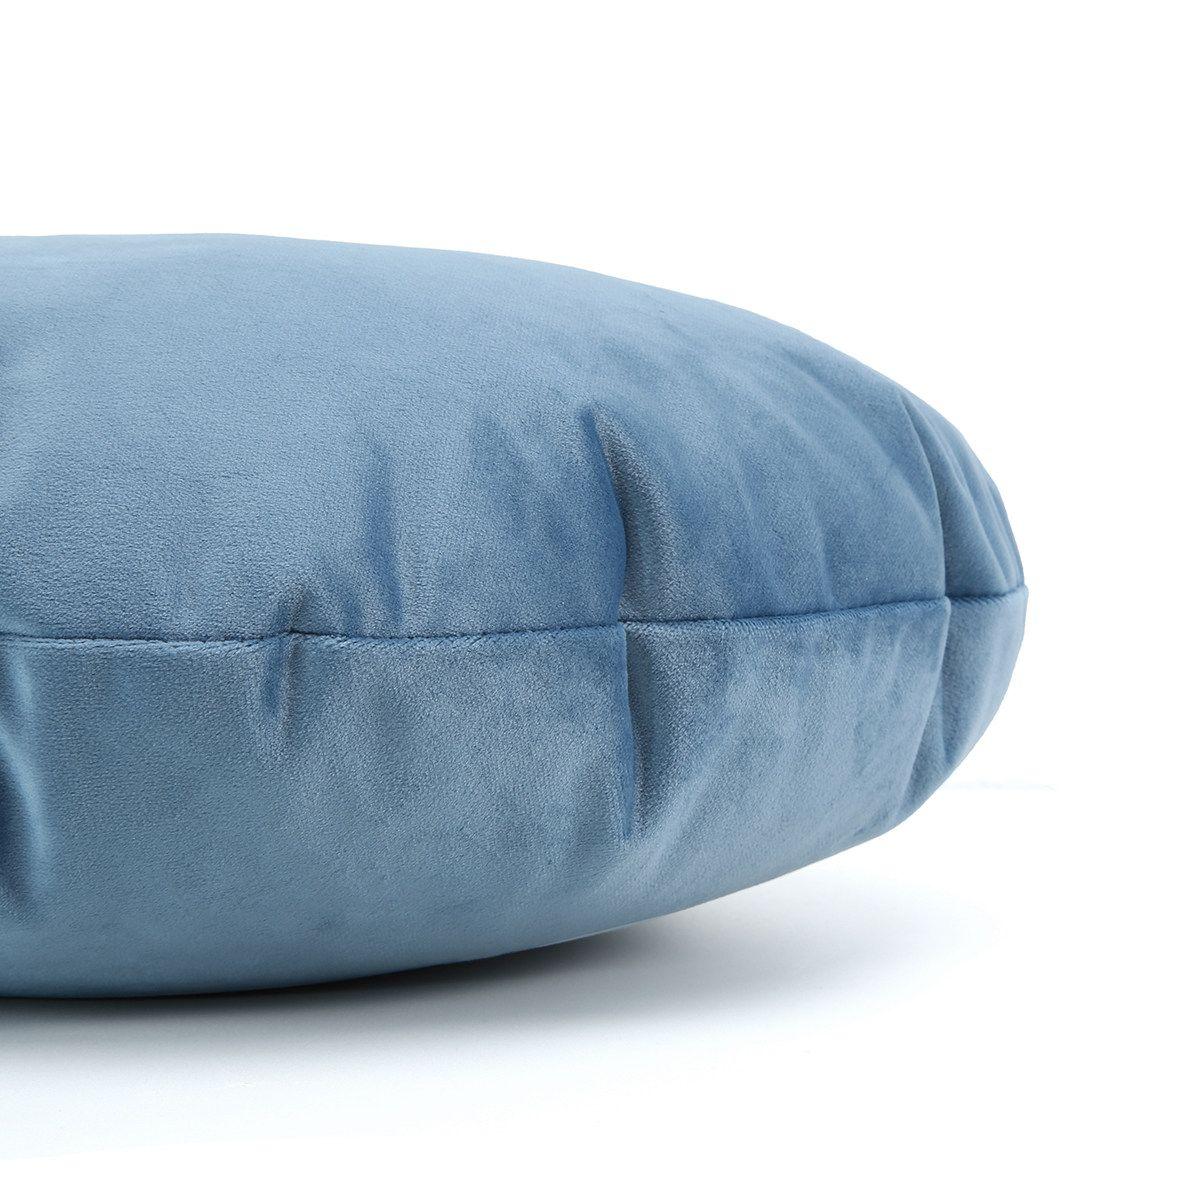 Alice Cushion Blue 8 Kmart Cushions, Decor, Home decor